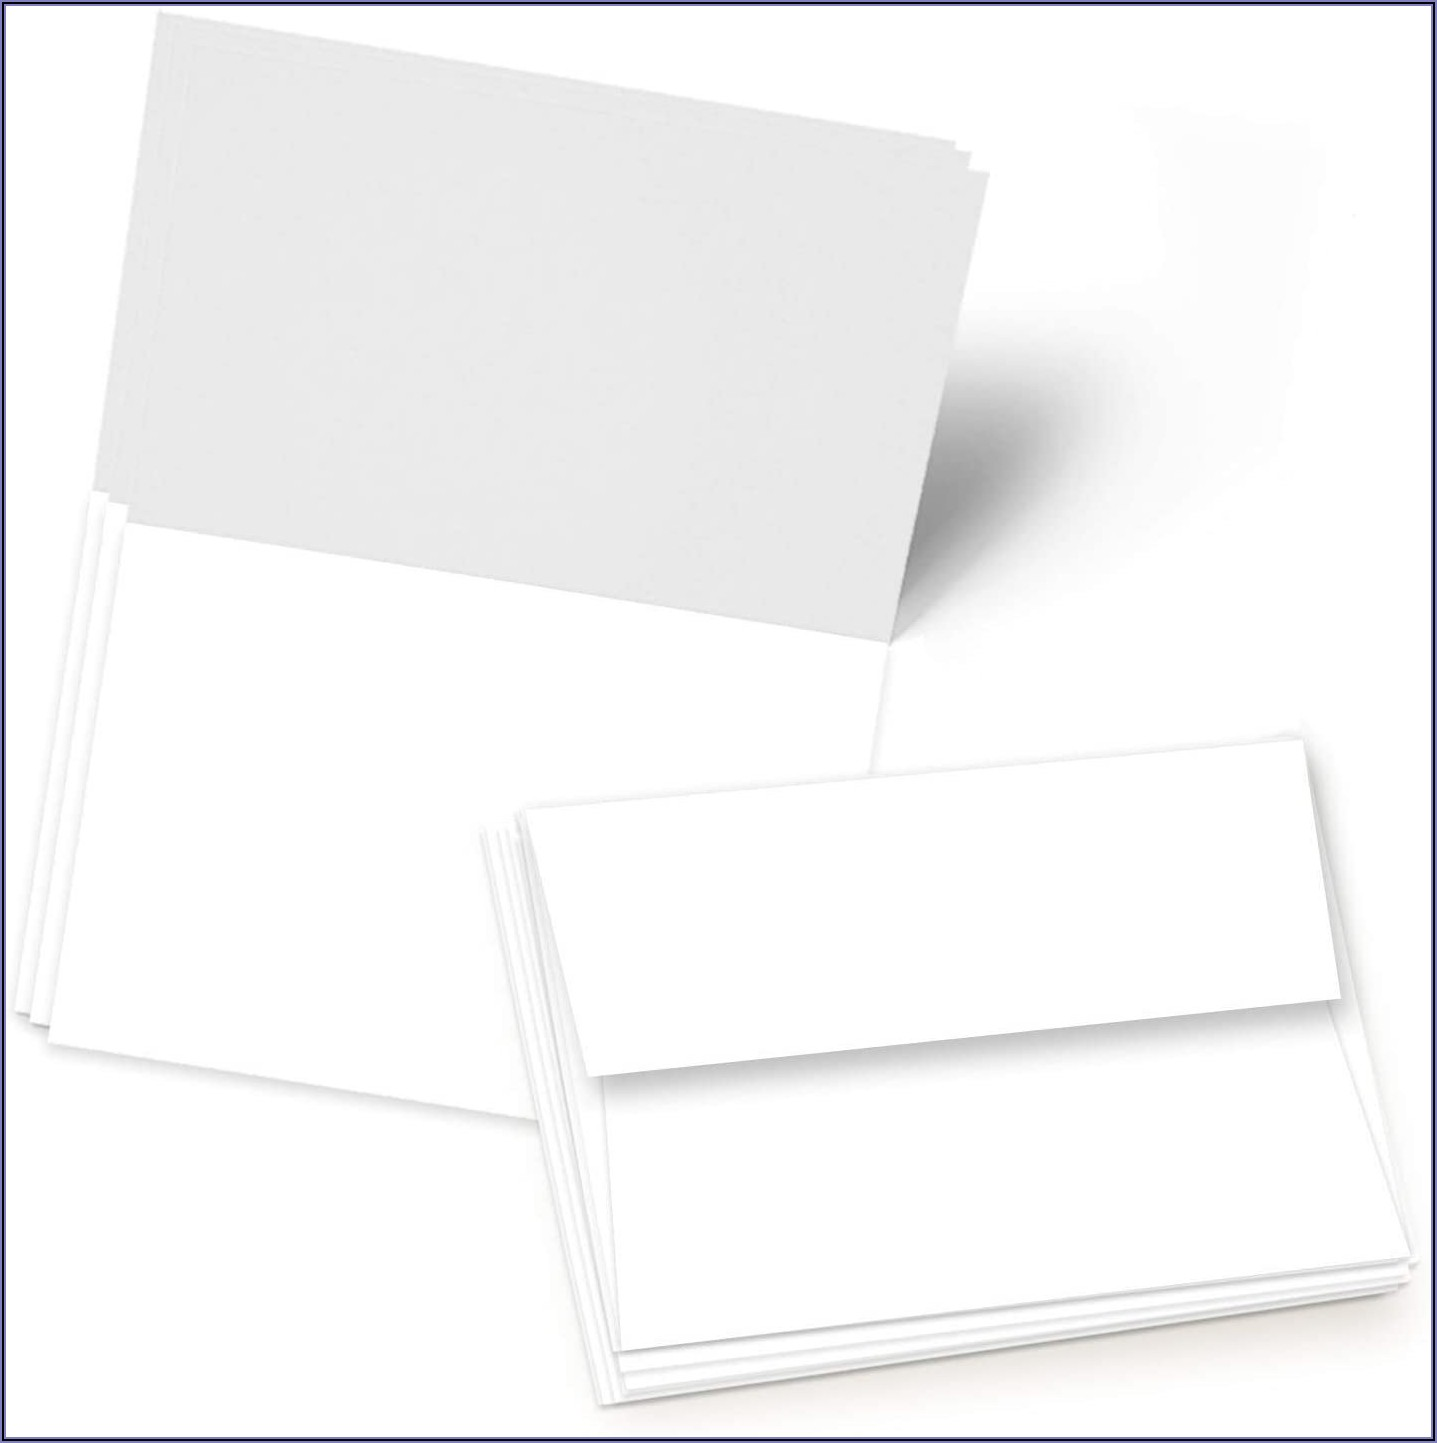 4x6 Envelopes Walmart Canada